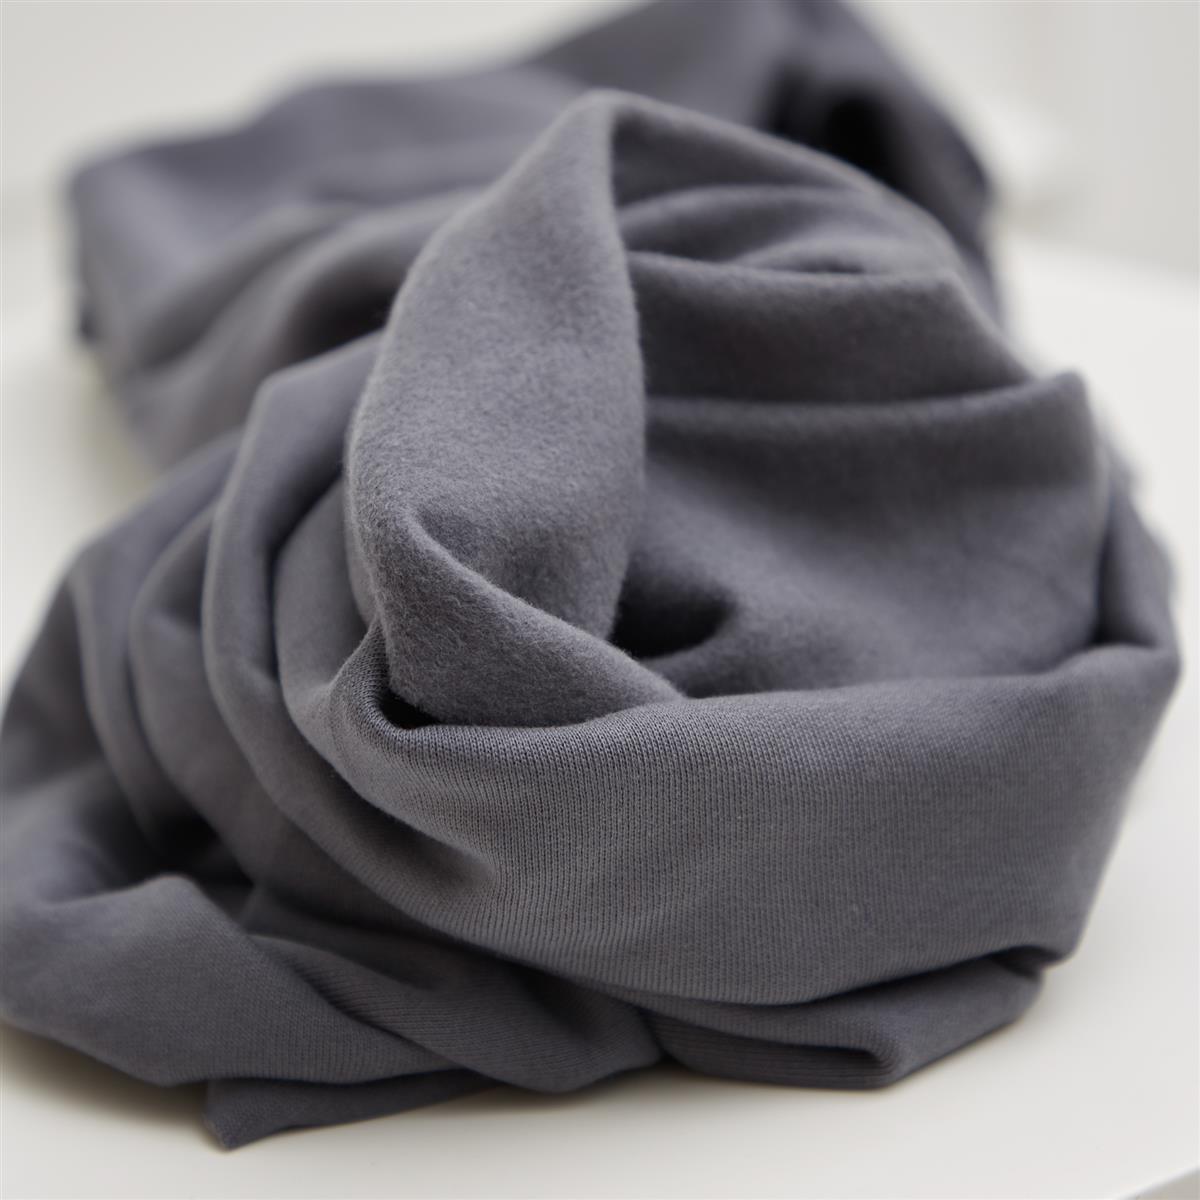 brushed-sweat-calm-grey1